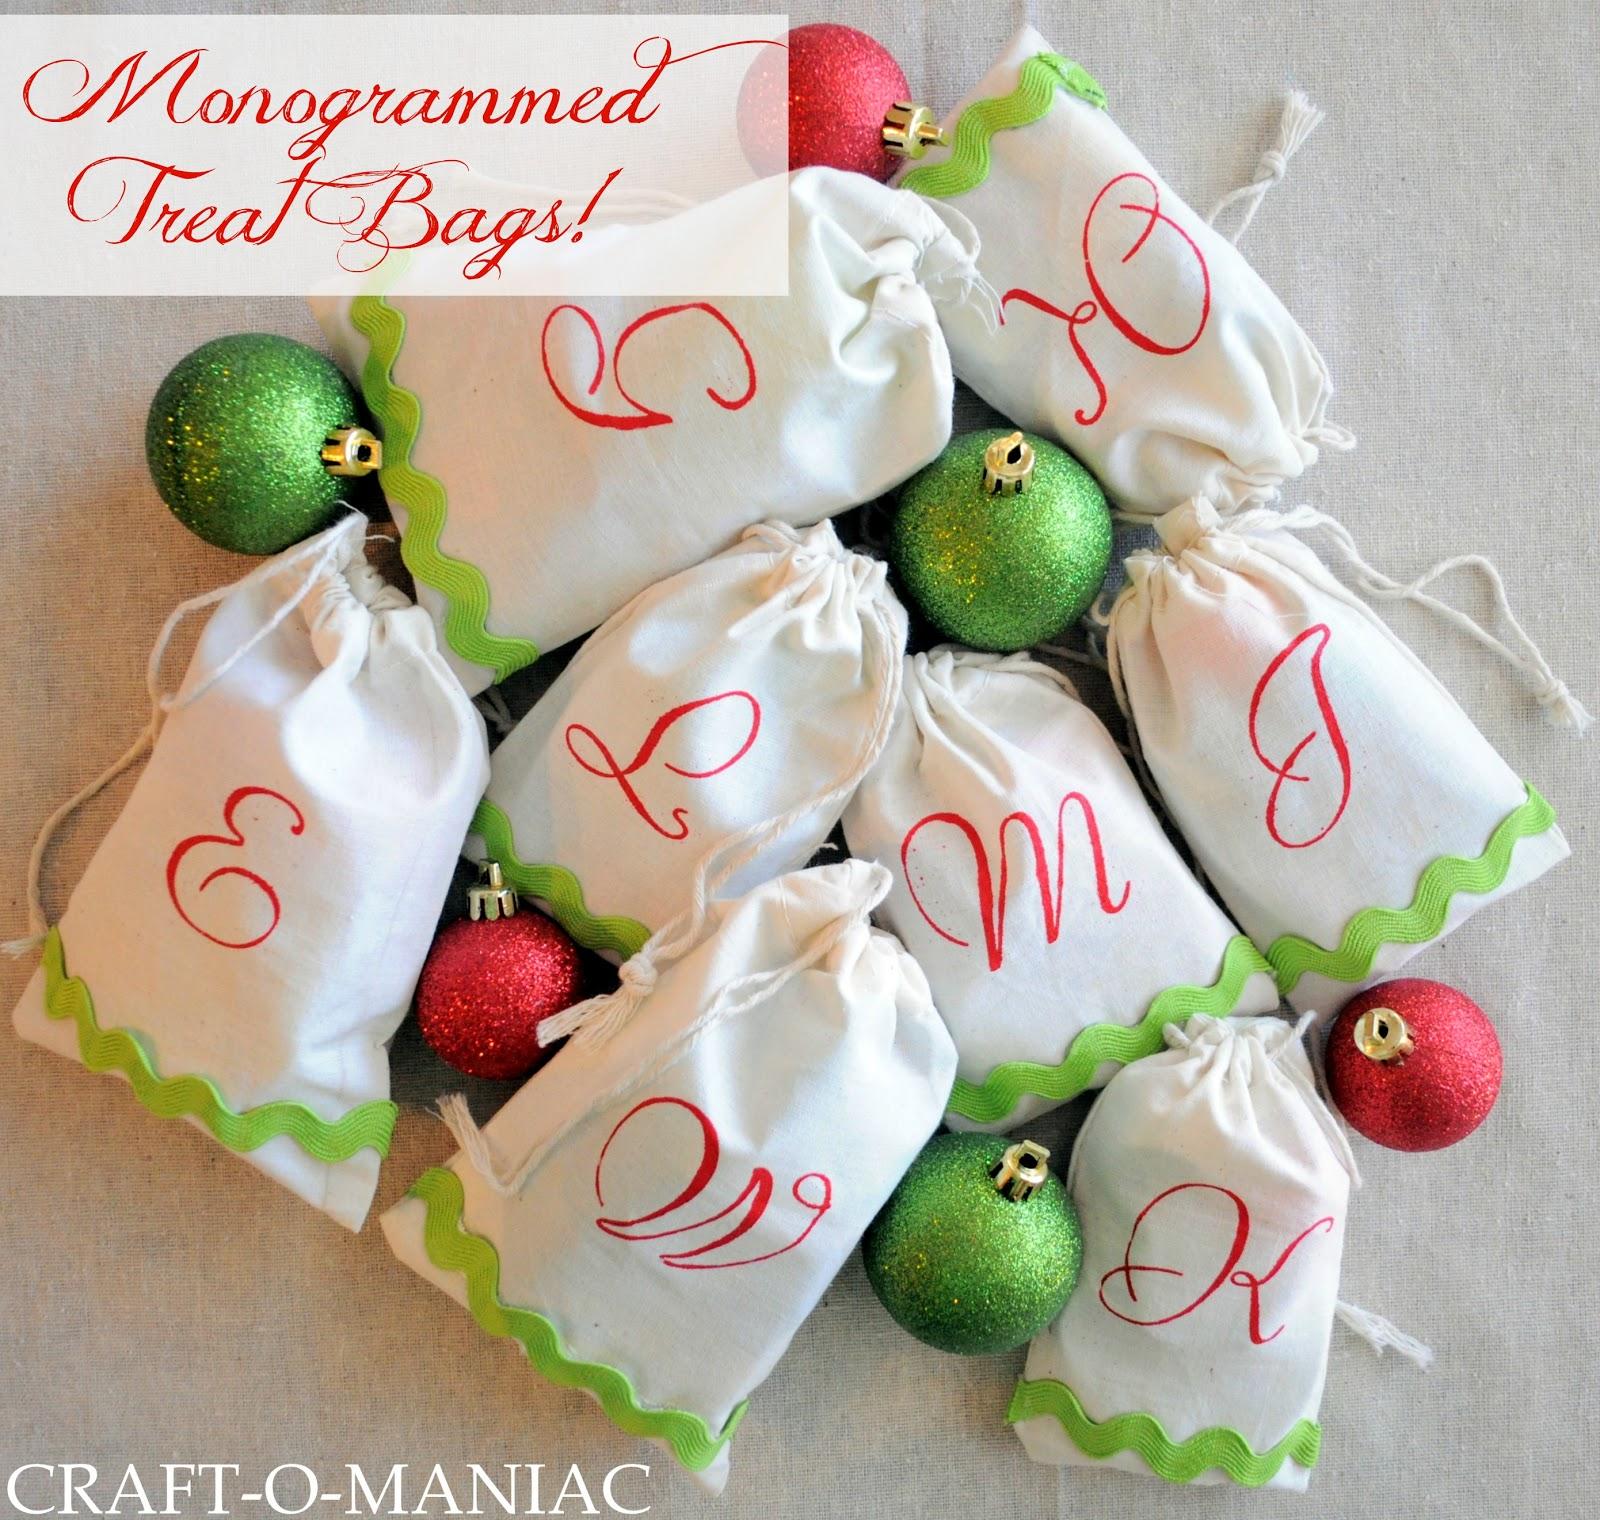 Personalized Handmade Christmas Gift Guide: 12 Terrific Handmade Christmas Gift Ideas!